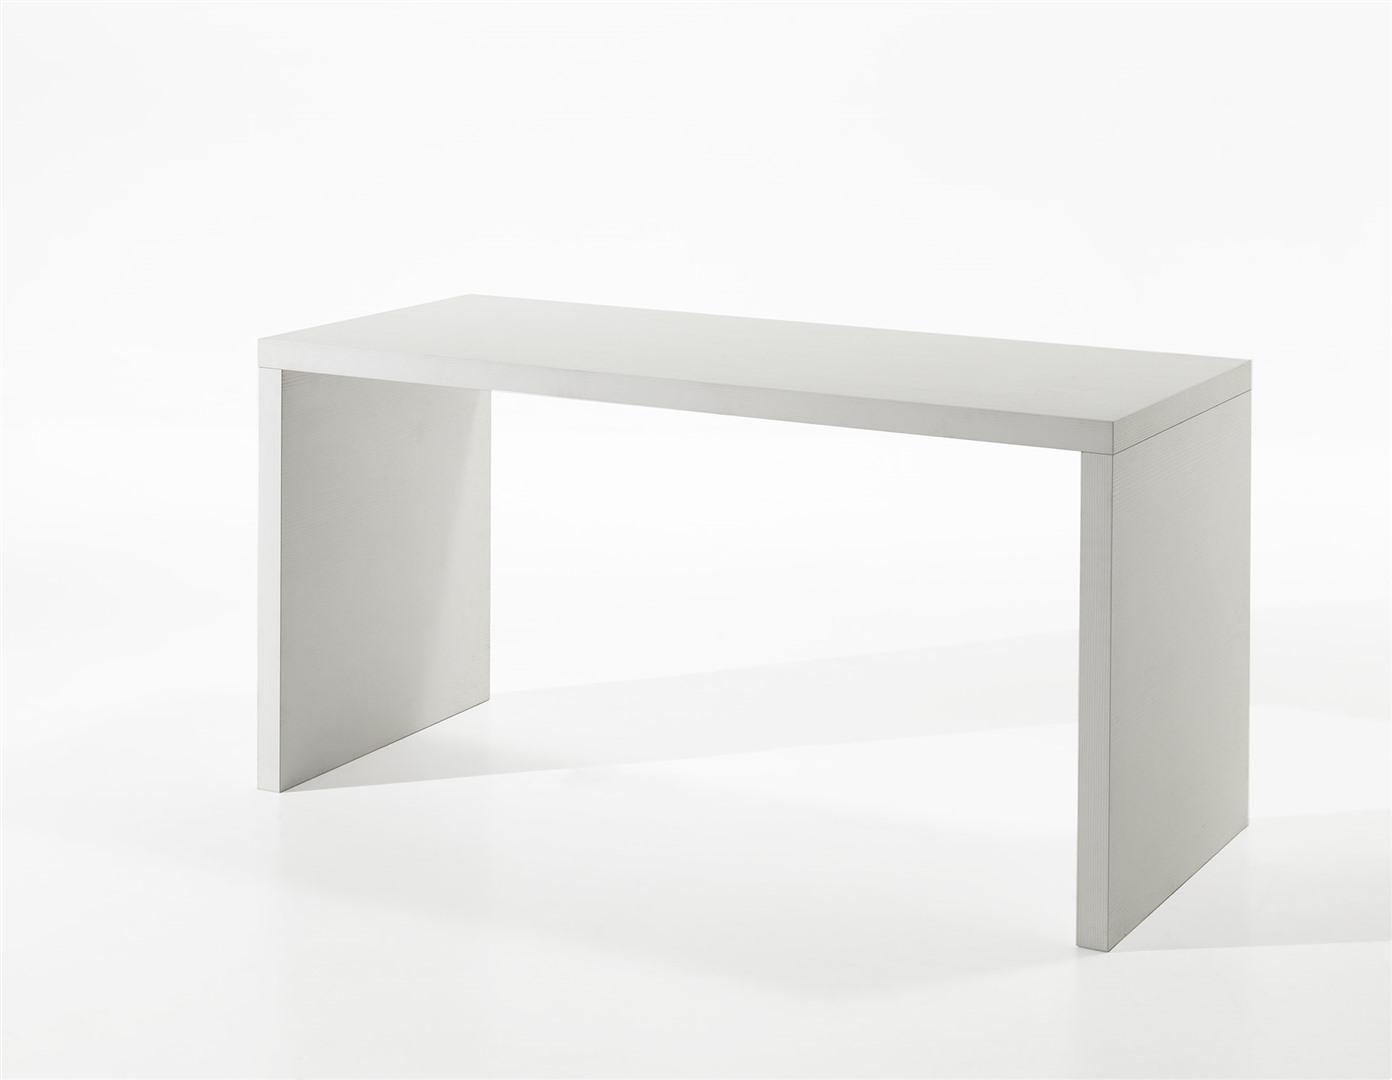 bureau wit 150cm breed krea. Black Bedroom Furniture Sets. Home Design Ideas